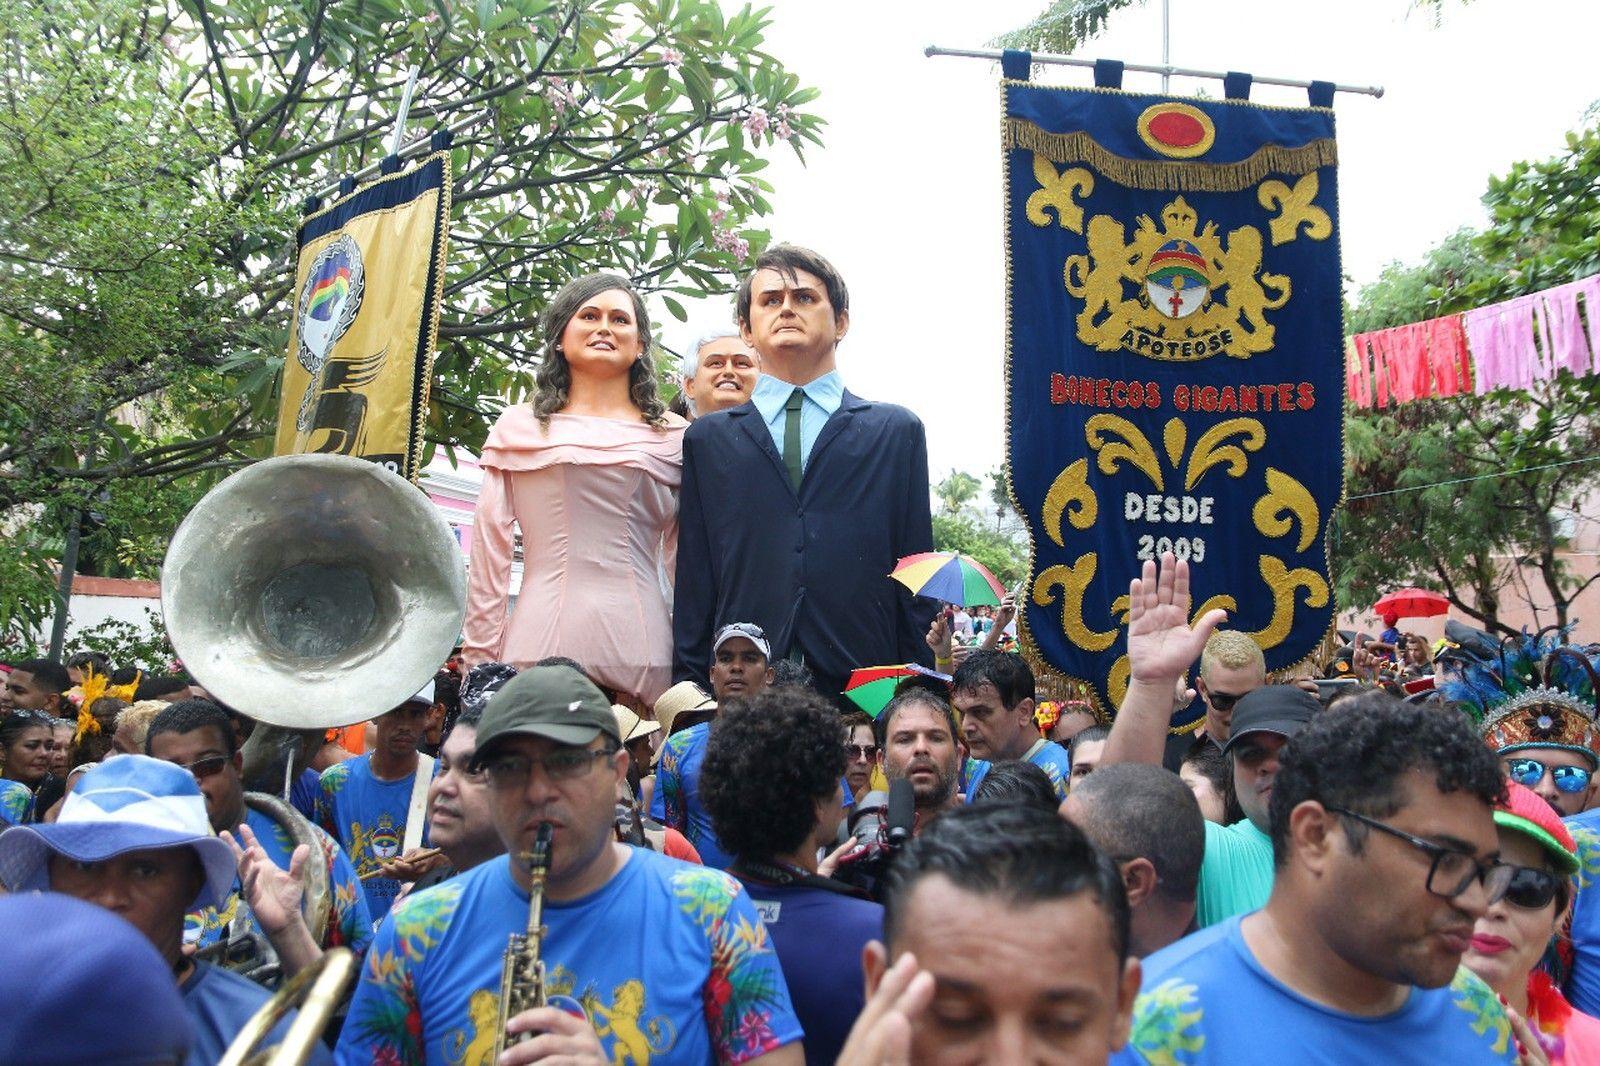 Alegorias de Jair Bolsonaro e Michelle durante folia em Olinda